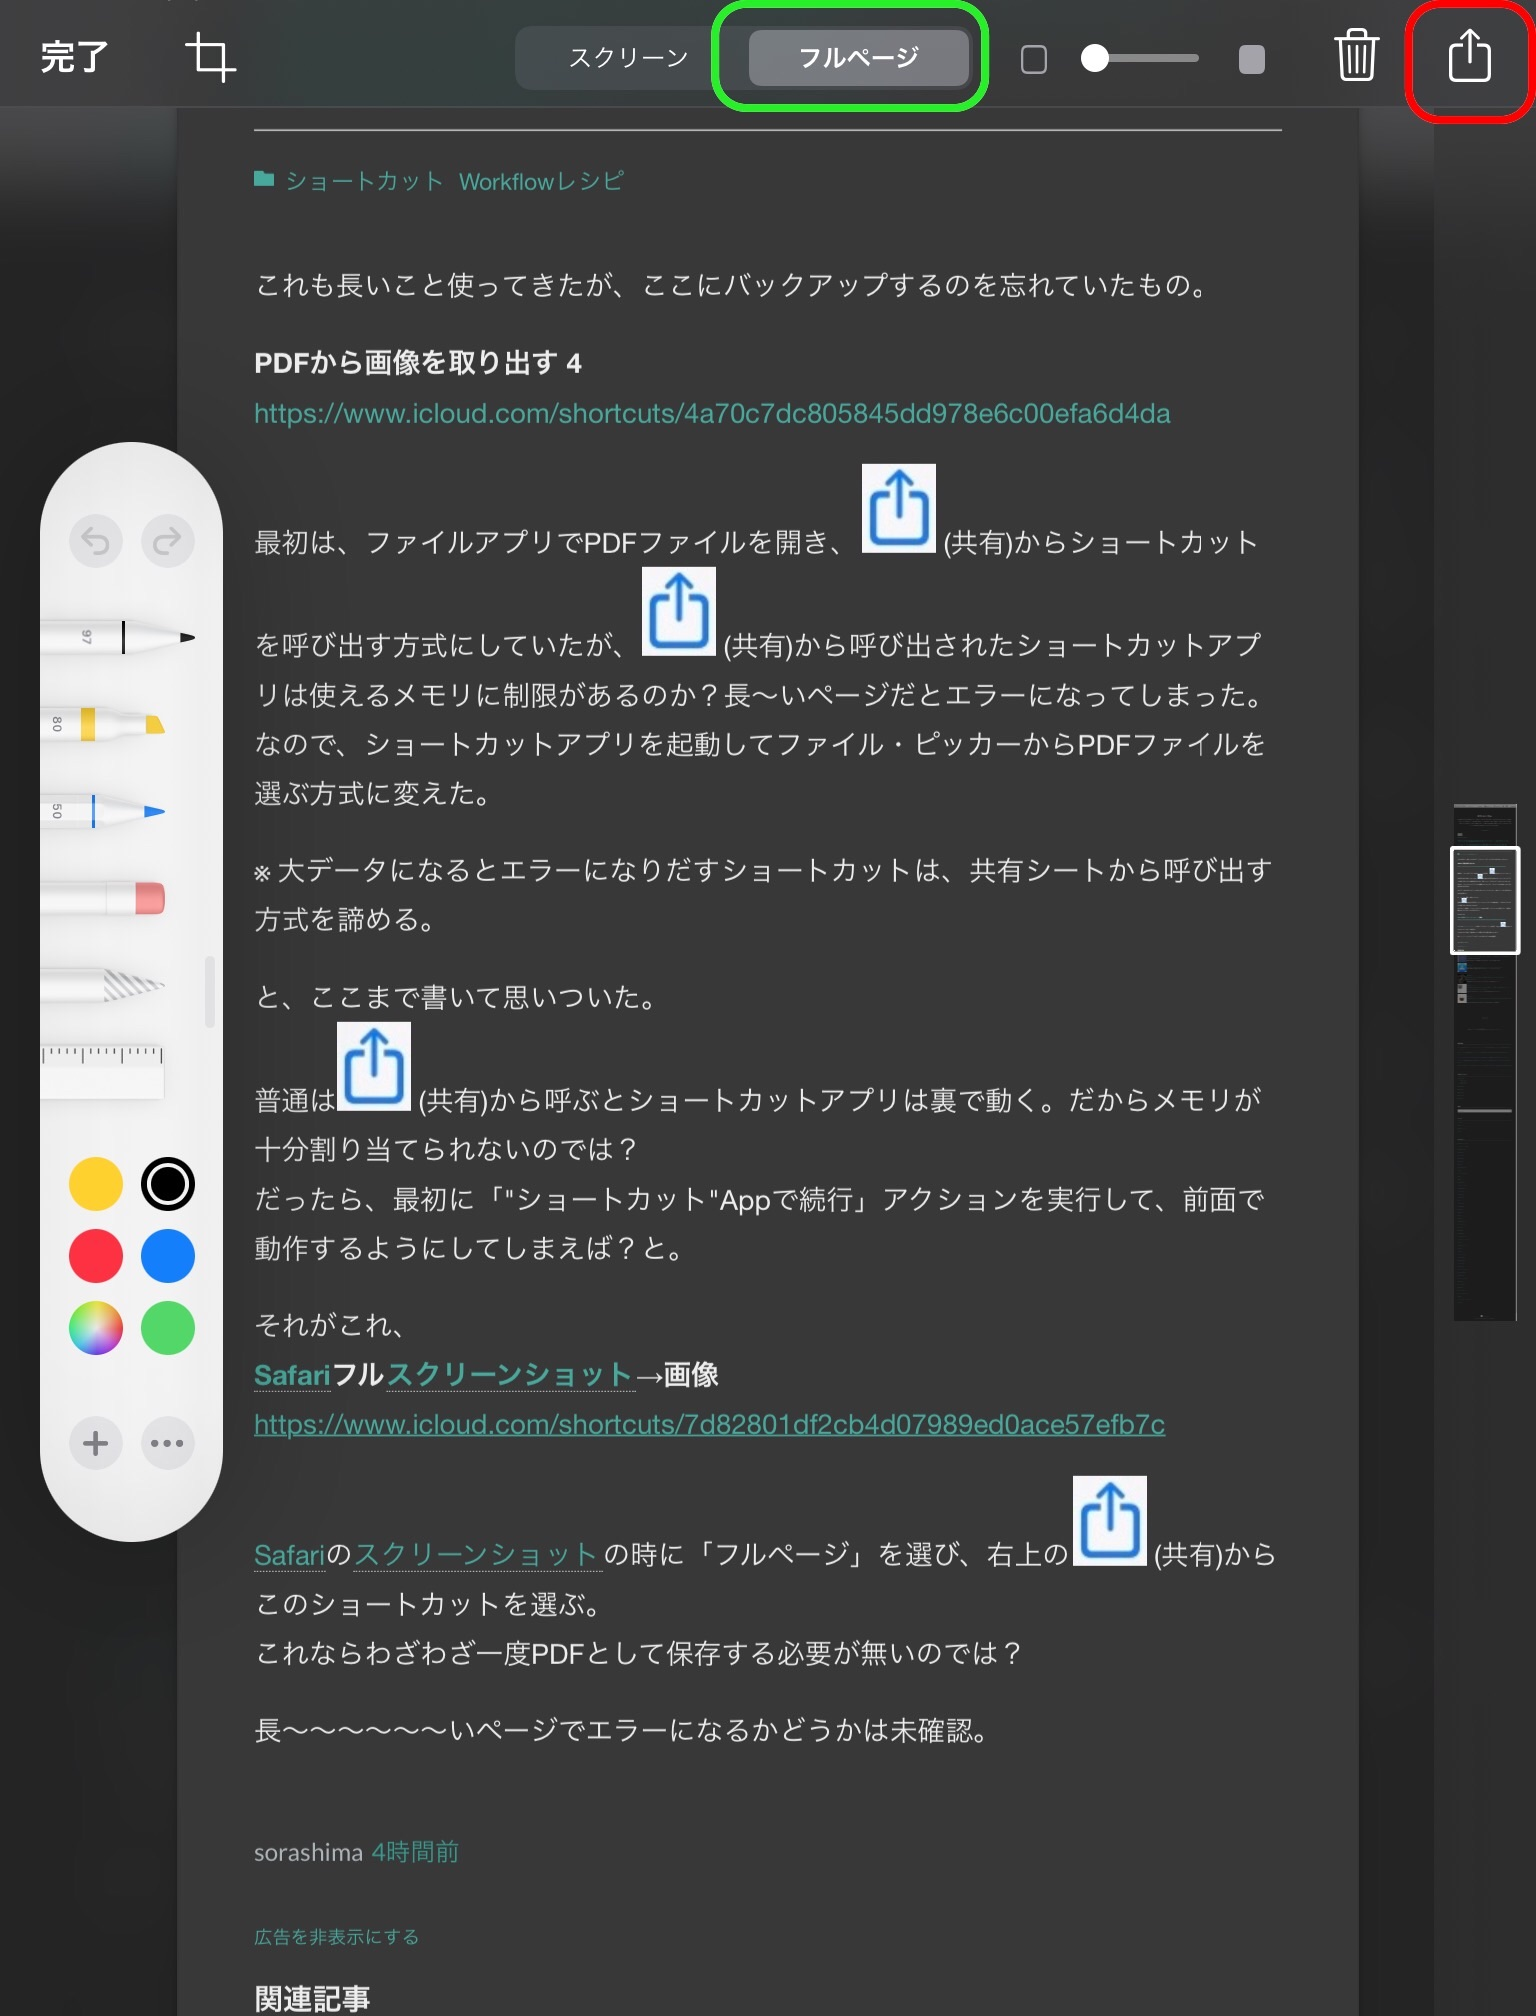 f:id:sorashima:20210302044704j:plain:w637